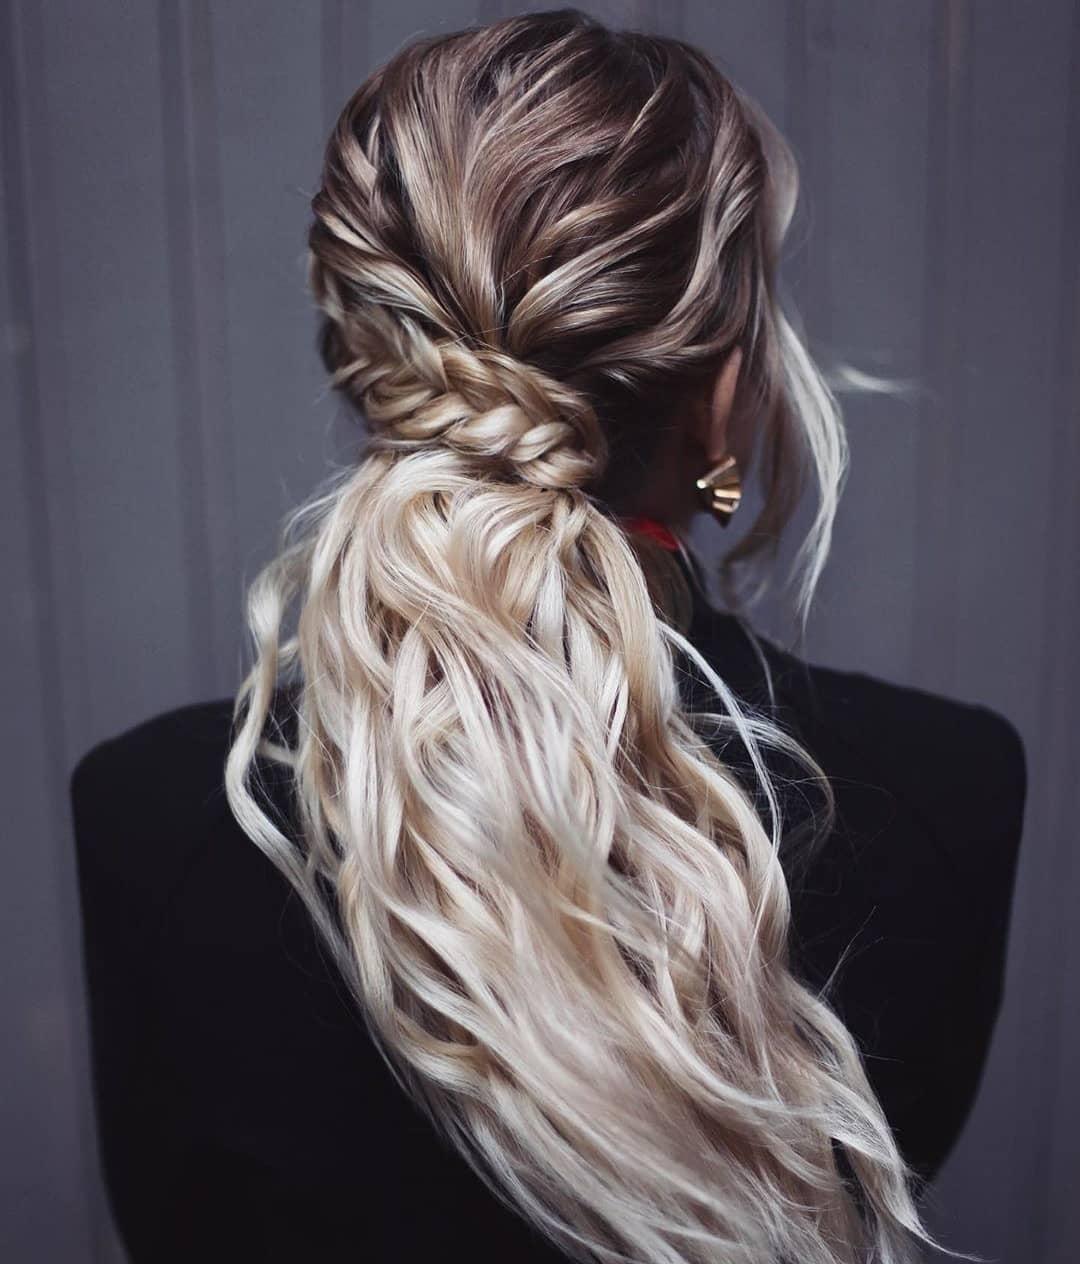 10 Cute Braided Hairstyles for Women & Girl   Long Braided ...